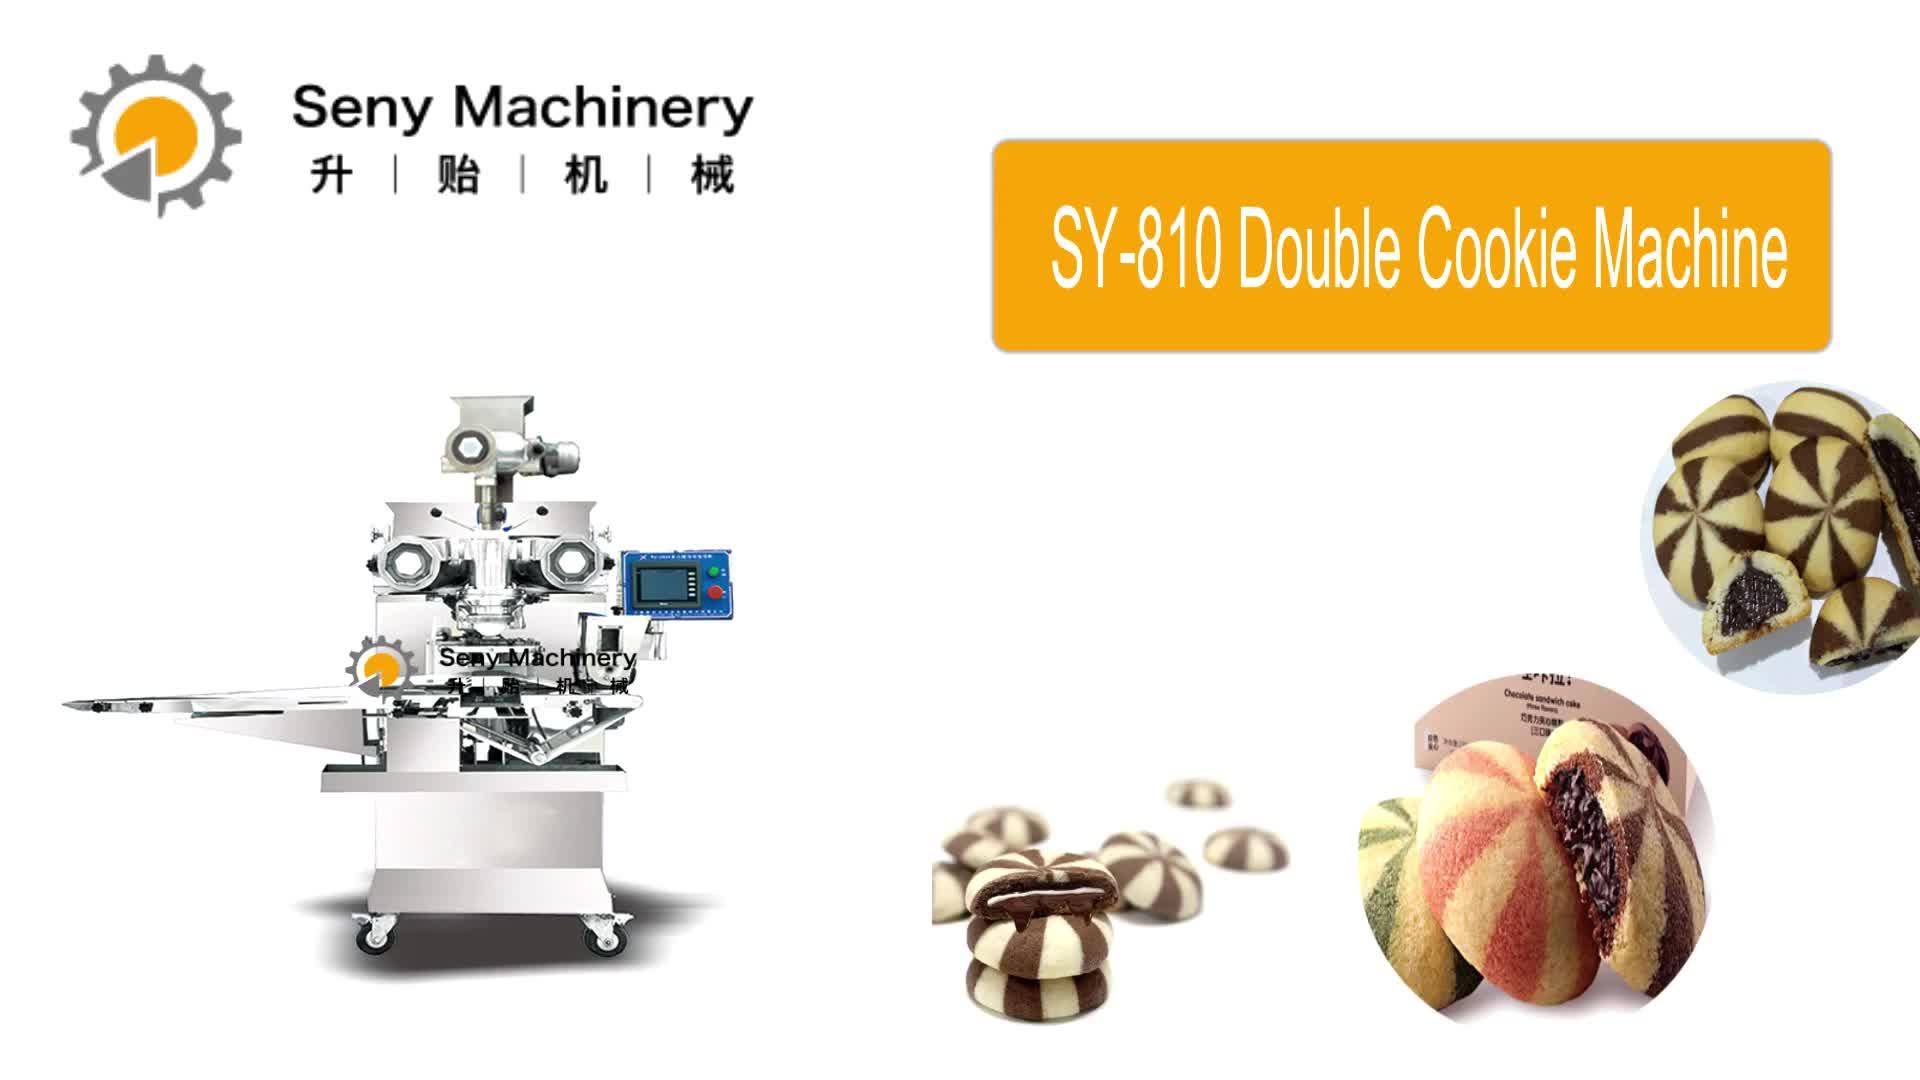 Goede Kwaliteit Promotionele Chocolade Gevulde Koekjes Making Machine